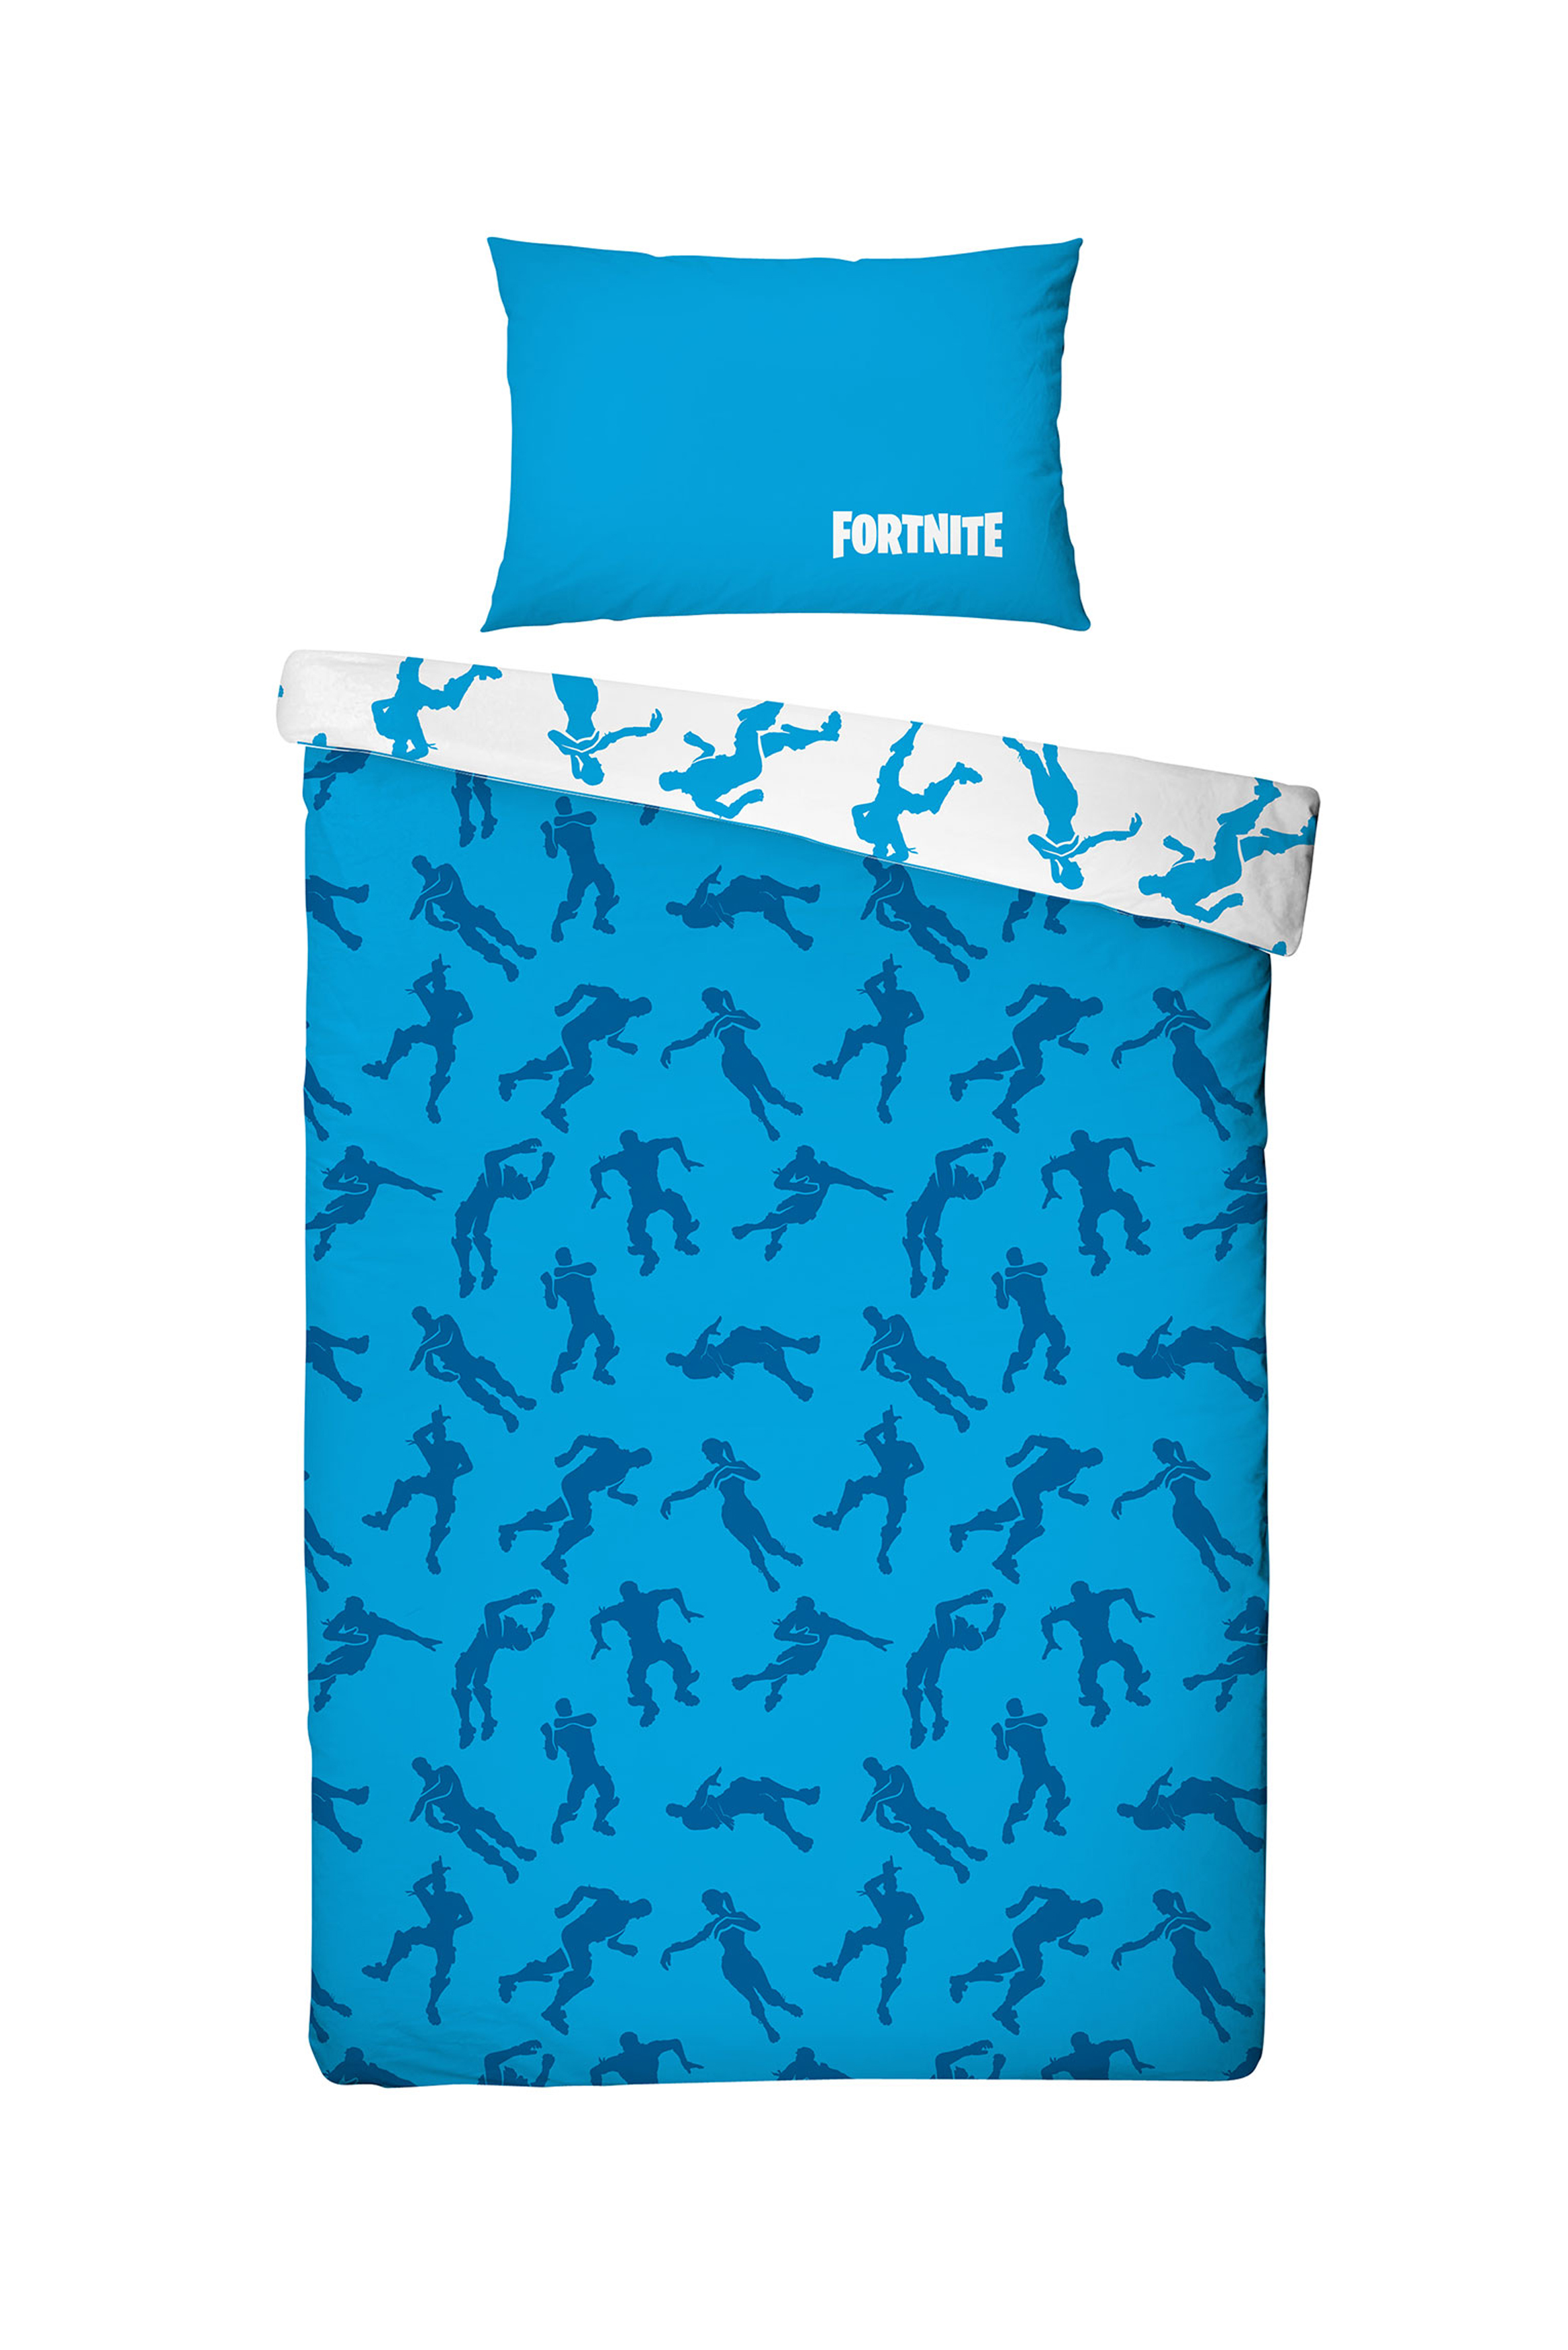 FORTNITE Dekbed Overtrek Emotes Blauw - Wit, 140x200